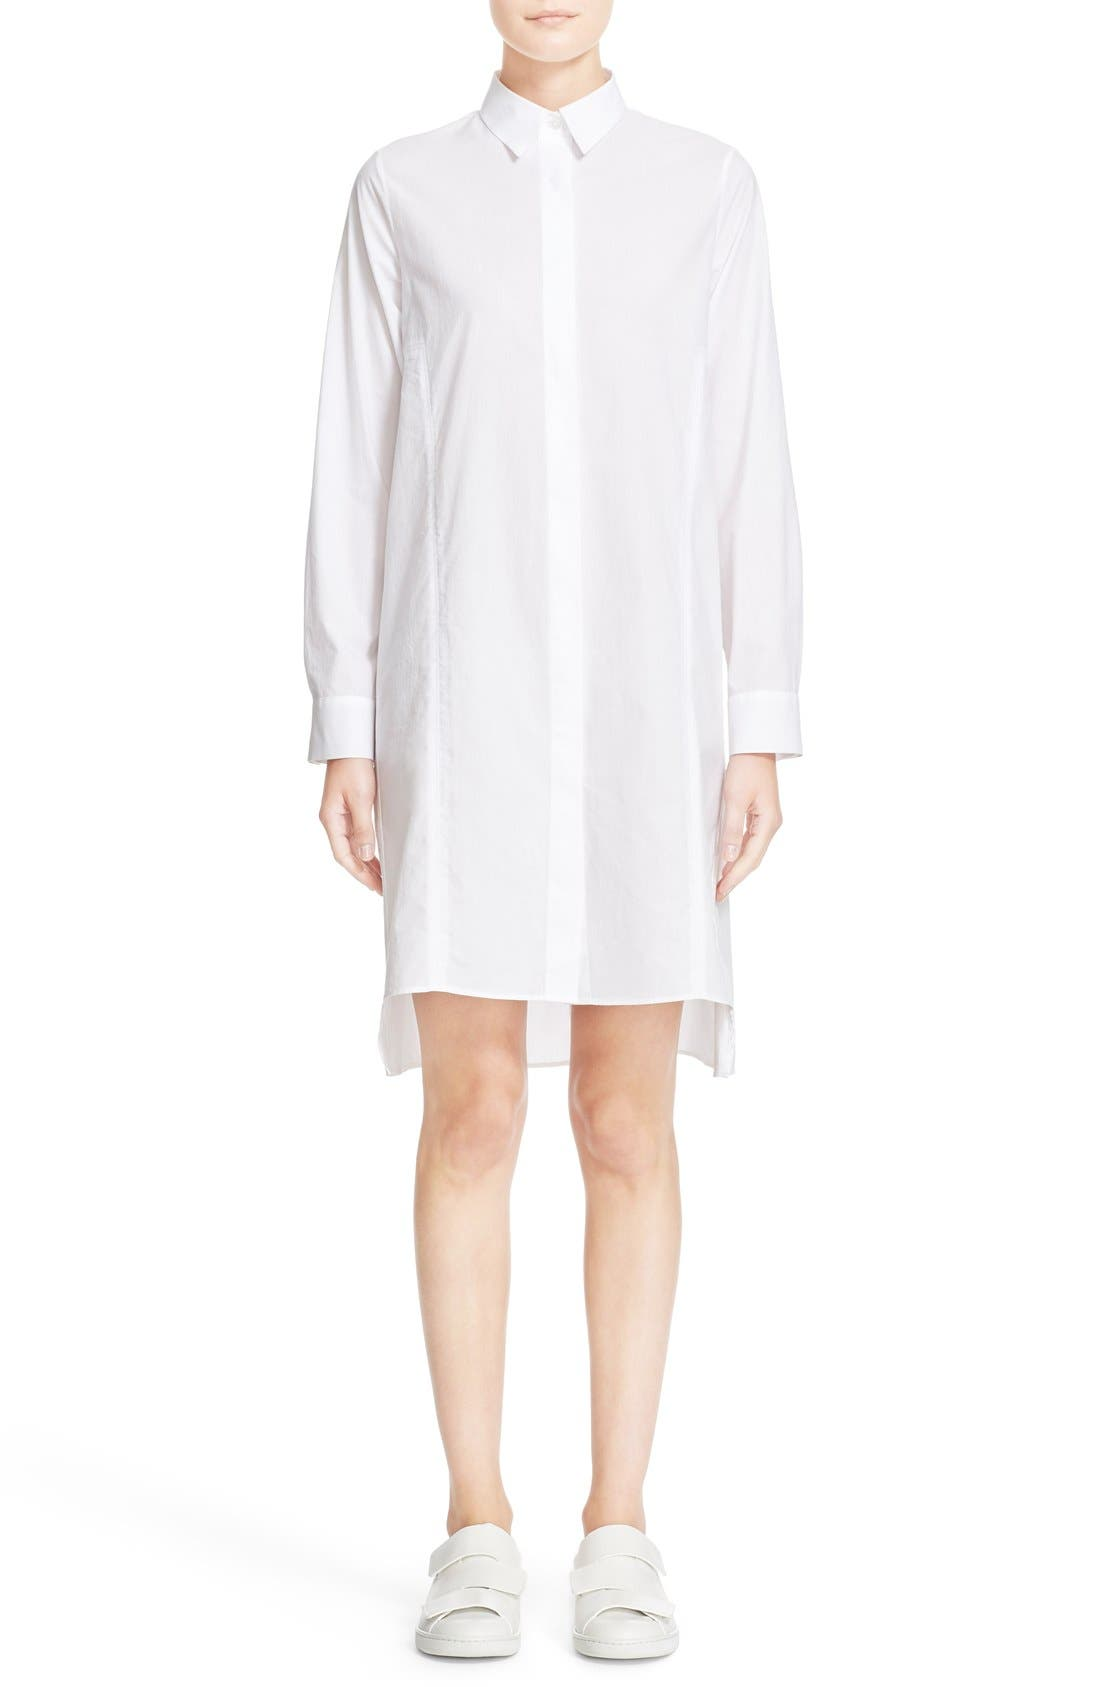 Main Image - ACNE Studios 'Rosamund' Piqué Shirtdress